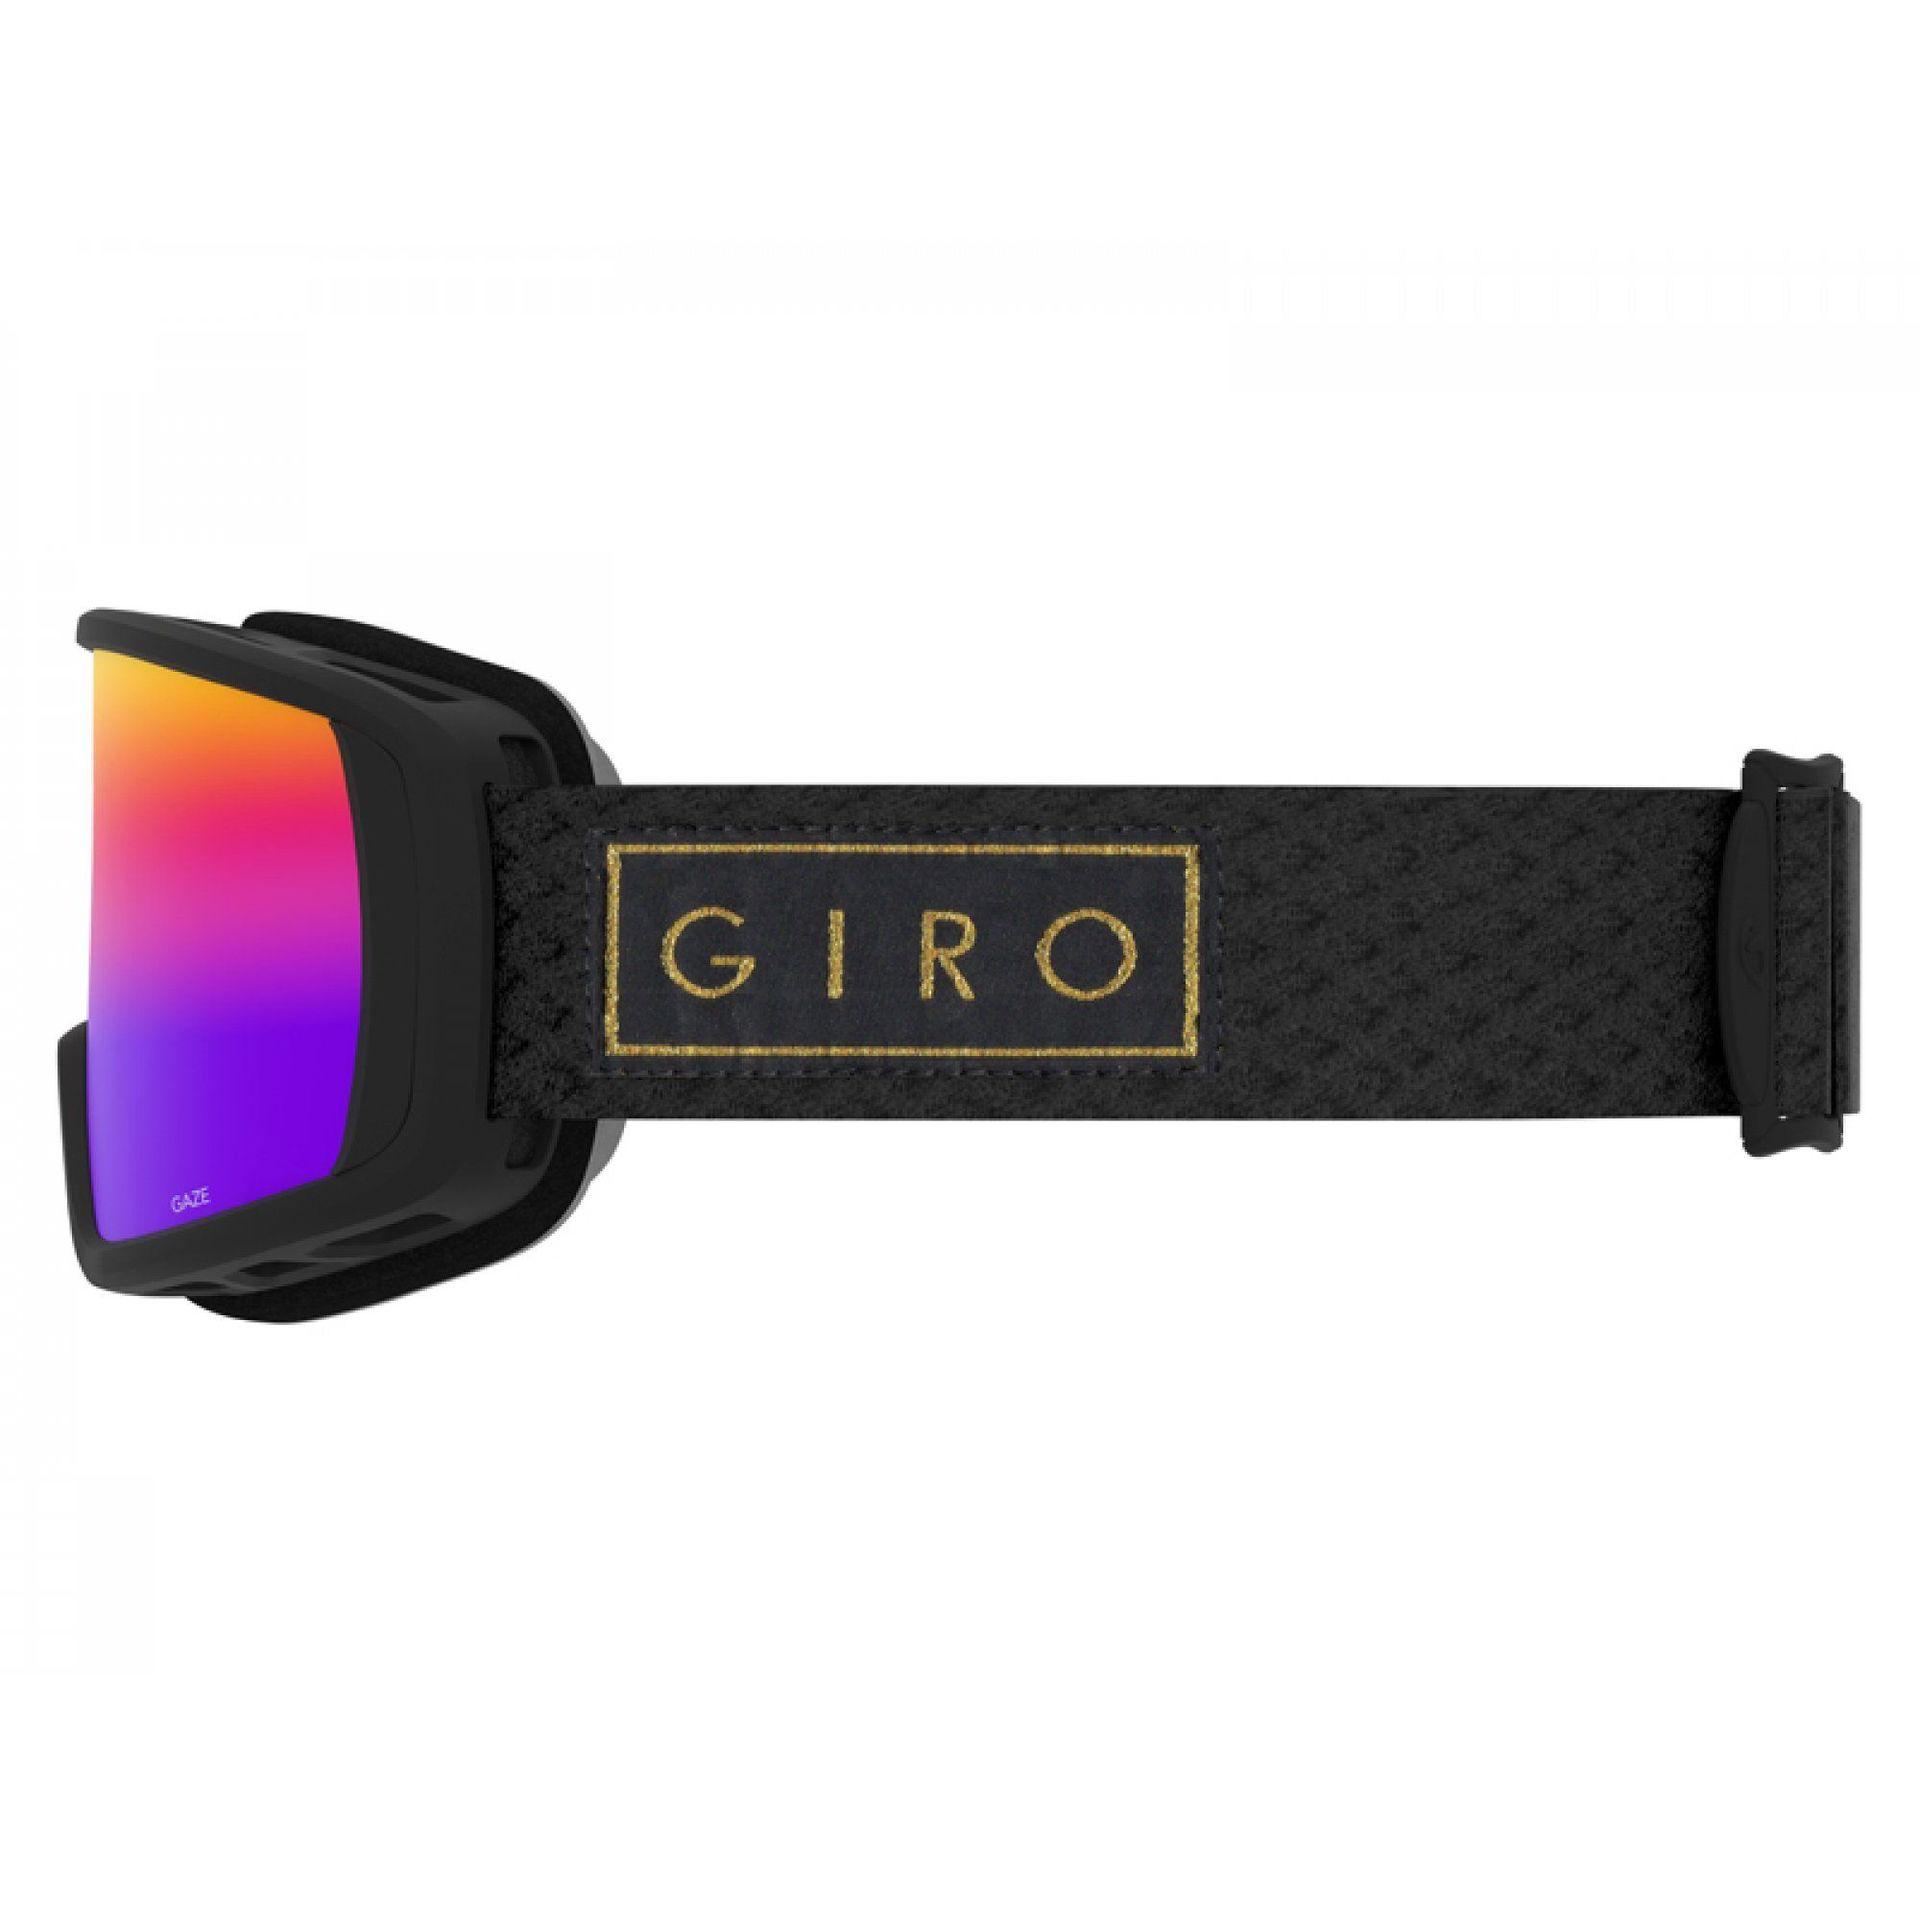 GOGLE GIRO GAZE BLACK GOLD BAR|ROSE SPECTRUM 3